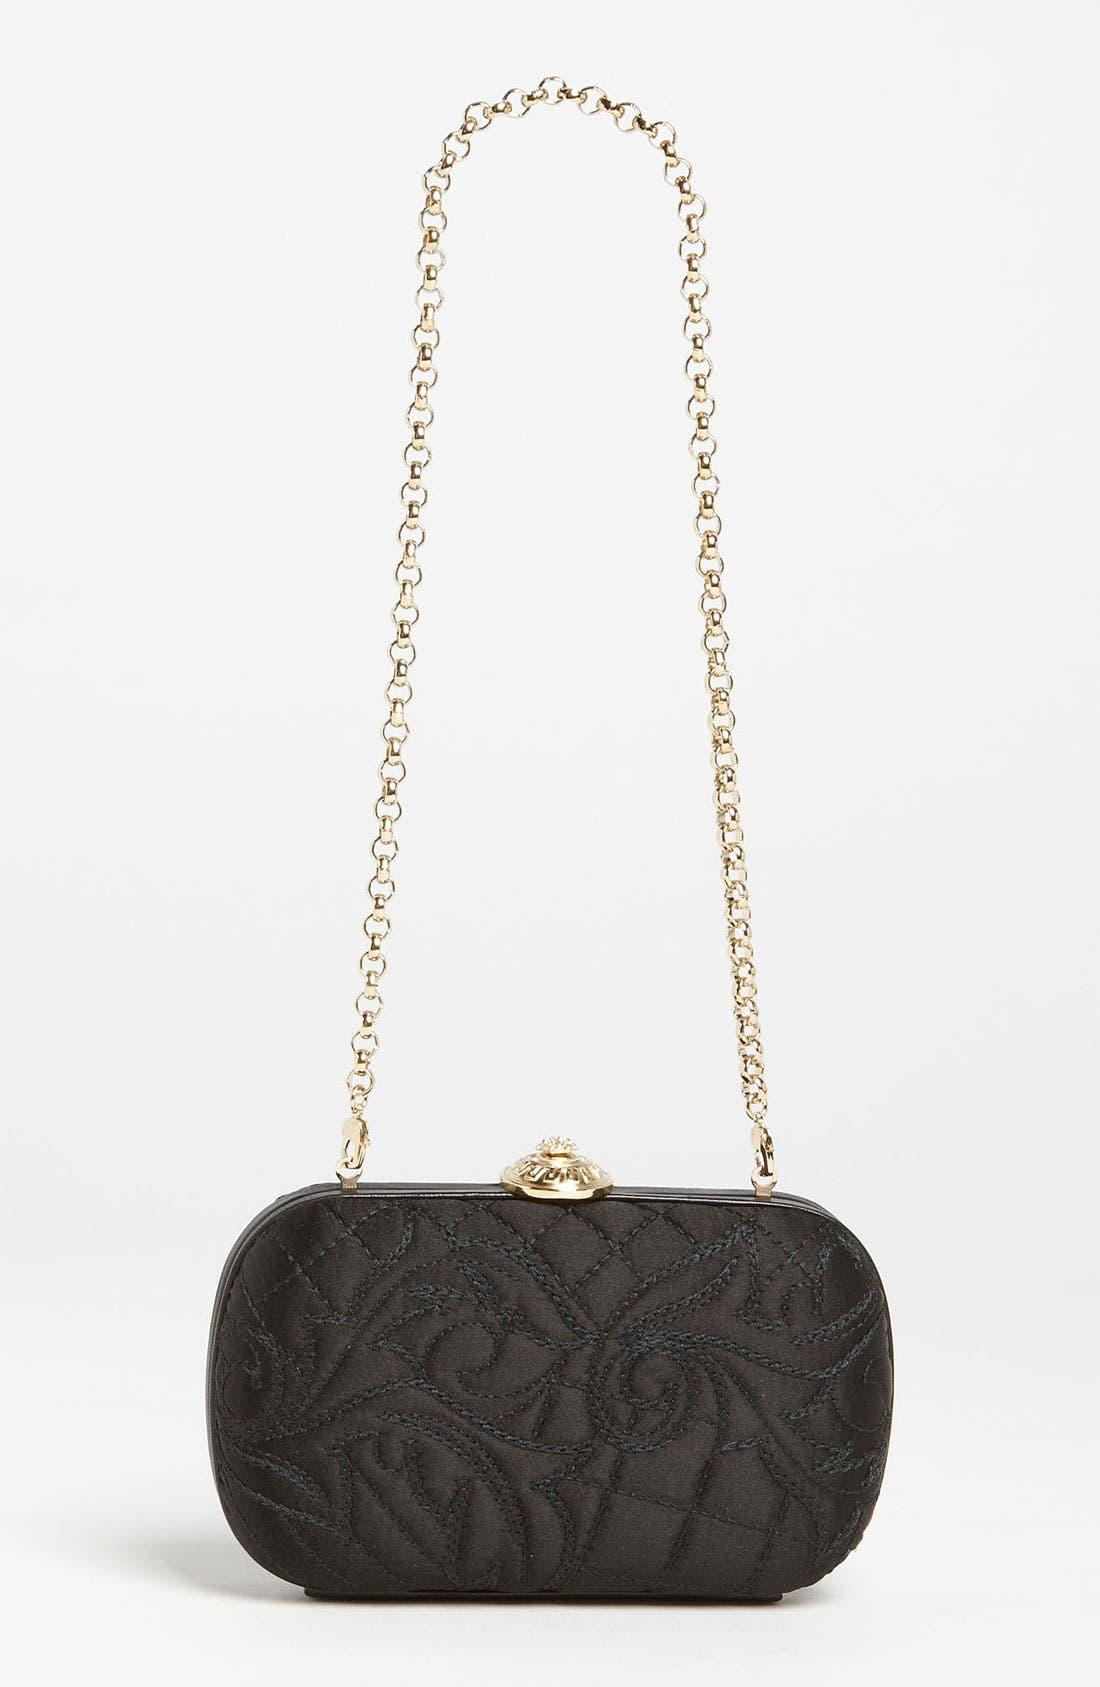 Main Image - Versace 'Linea' Box Clutch